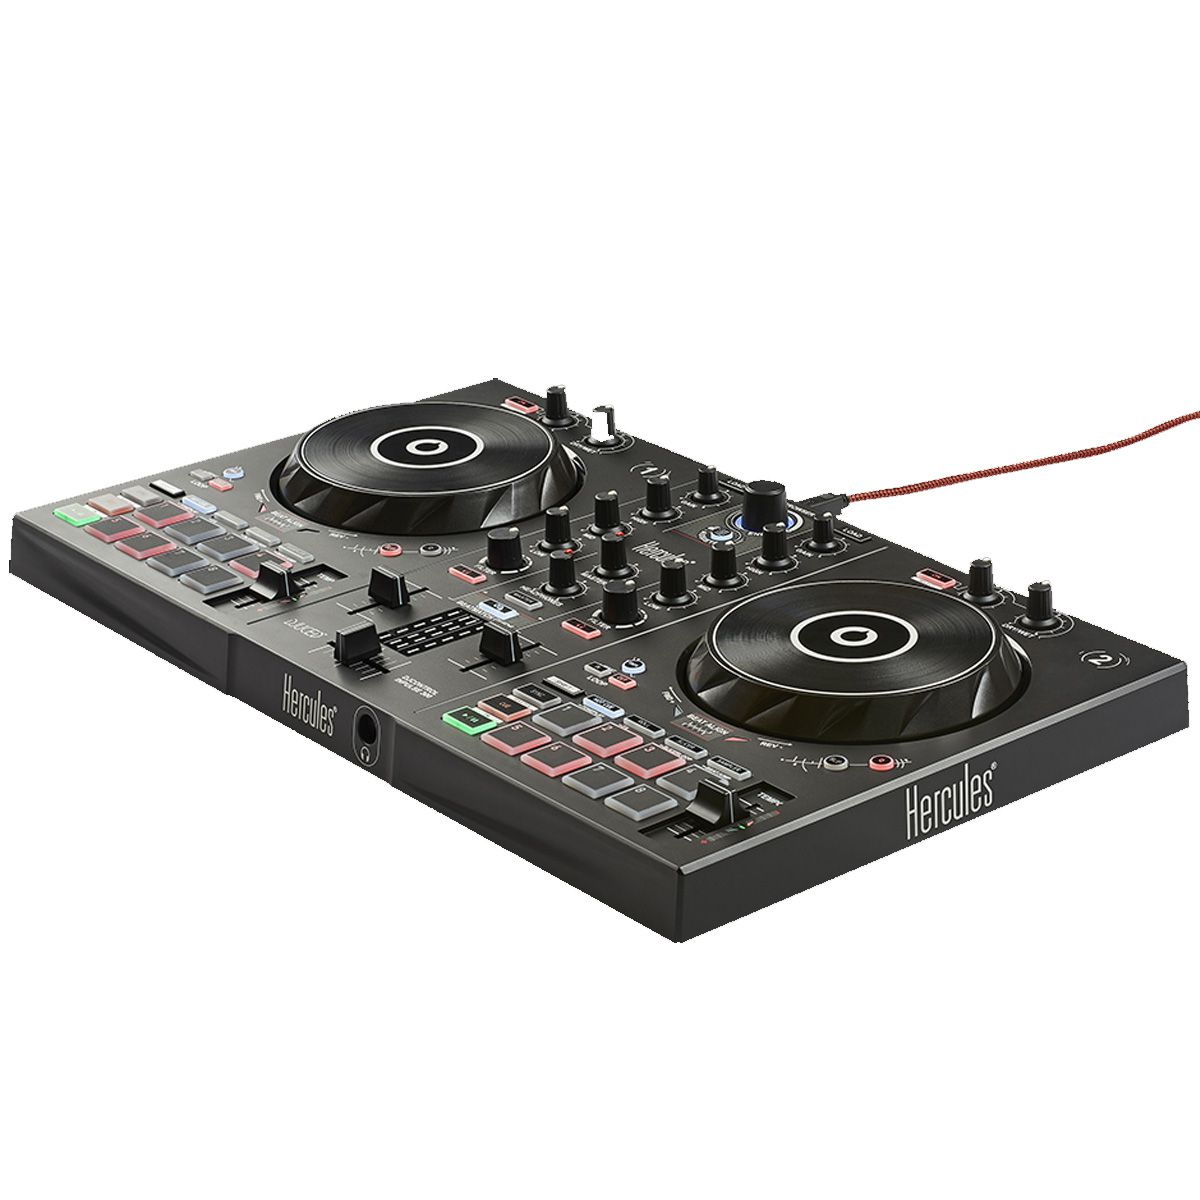 Controladora Hercules DJ Control Inpulse 300